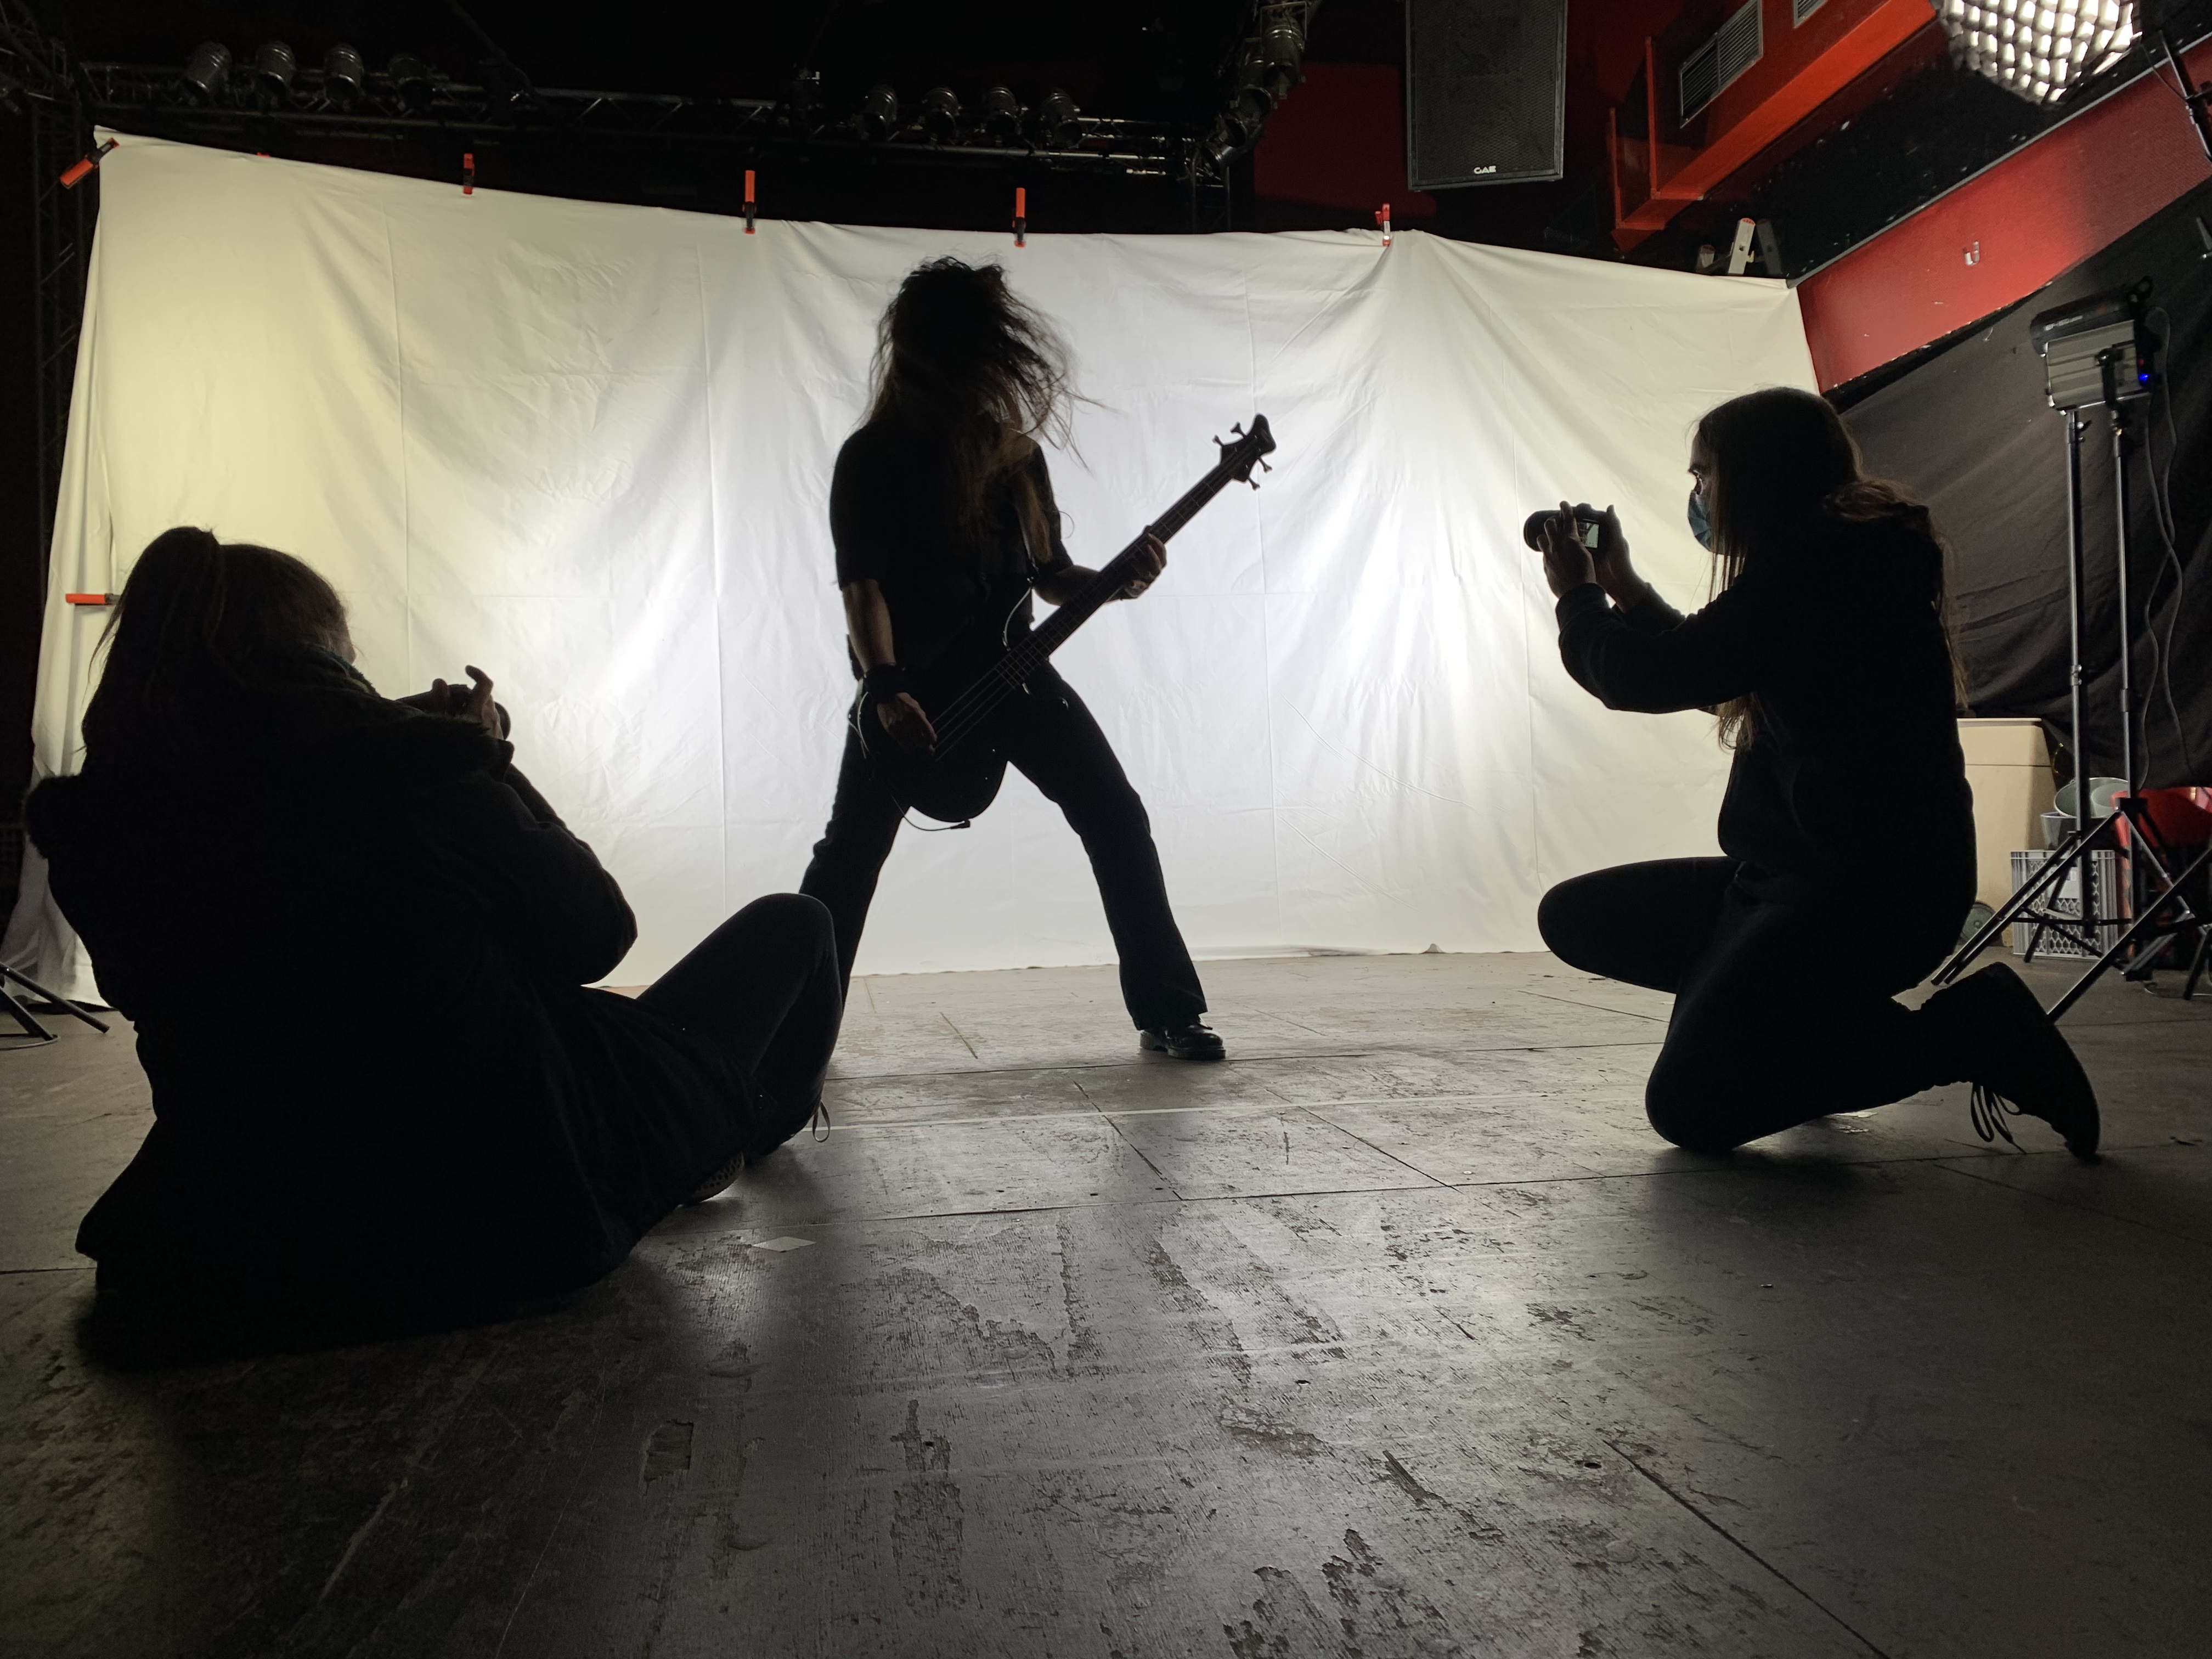 The-Very-End-Metal-Video-Shoot-behind-the-scenes_5456